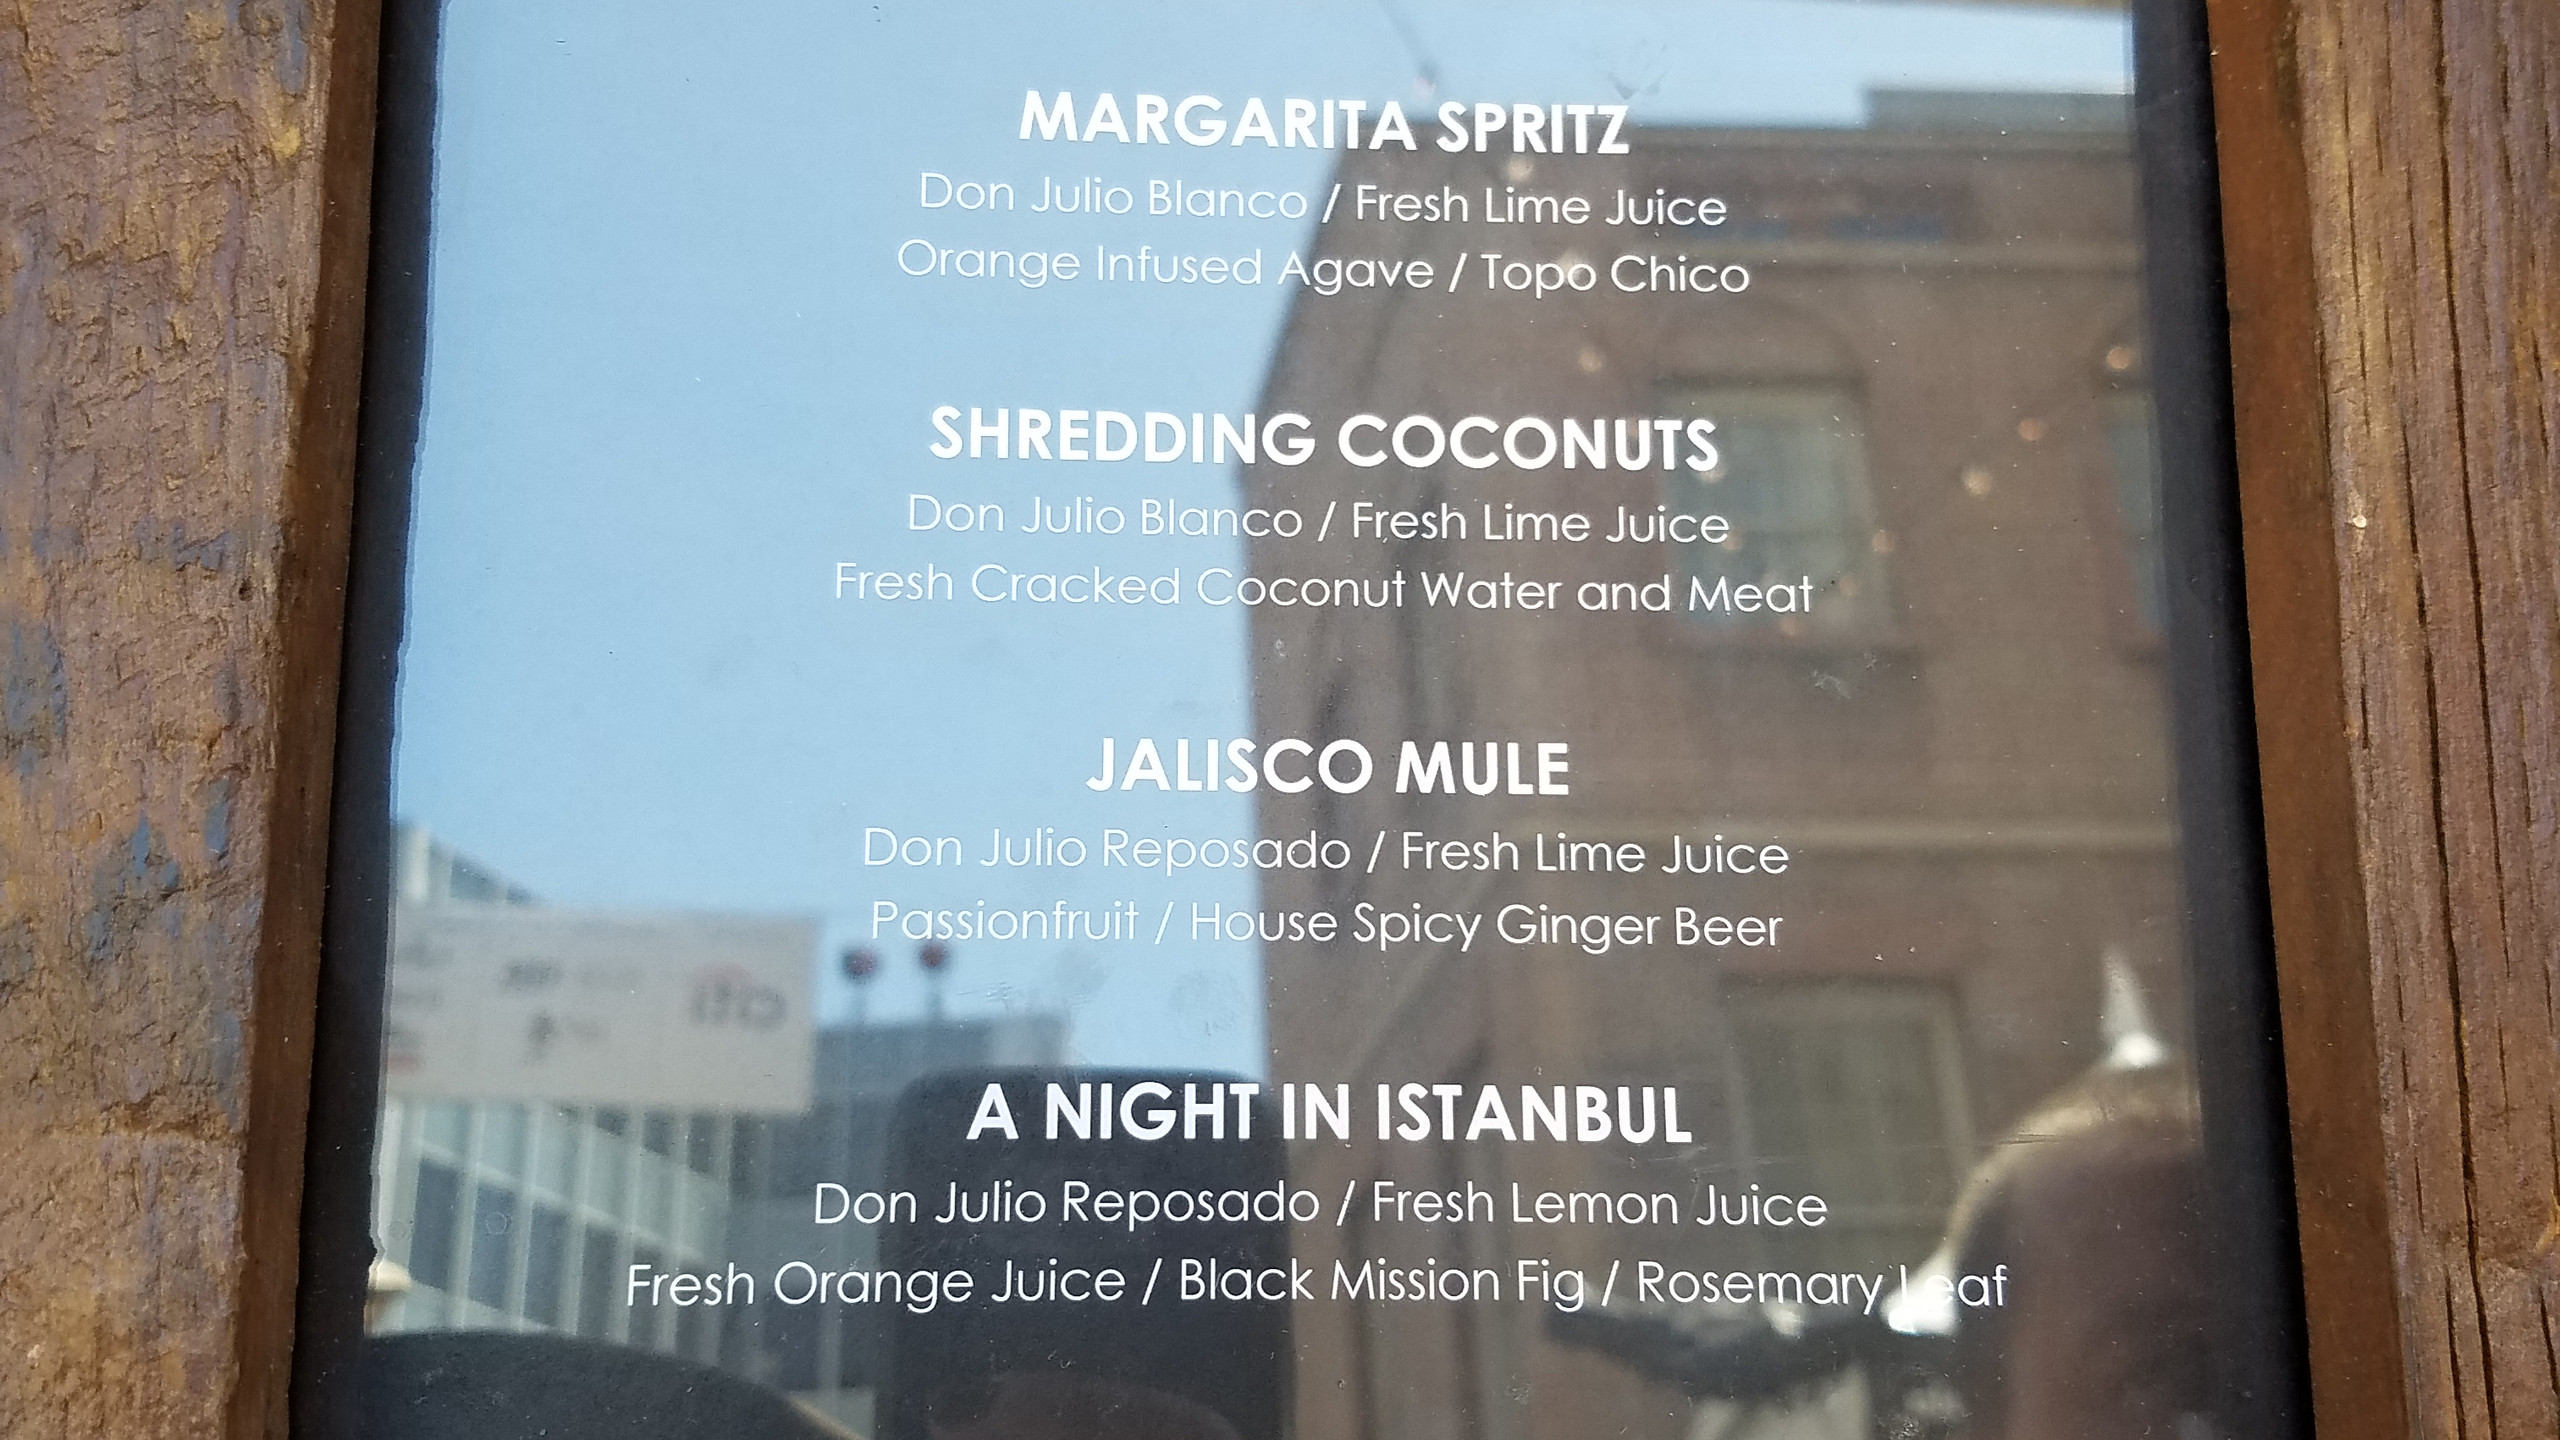 Margarita spritz & shredding coconu